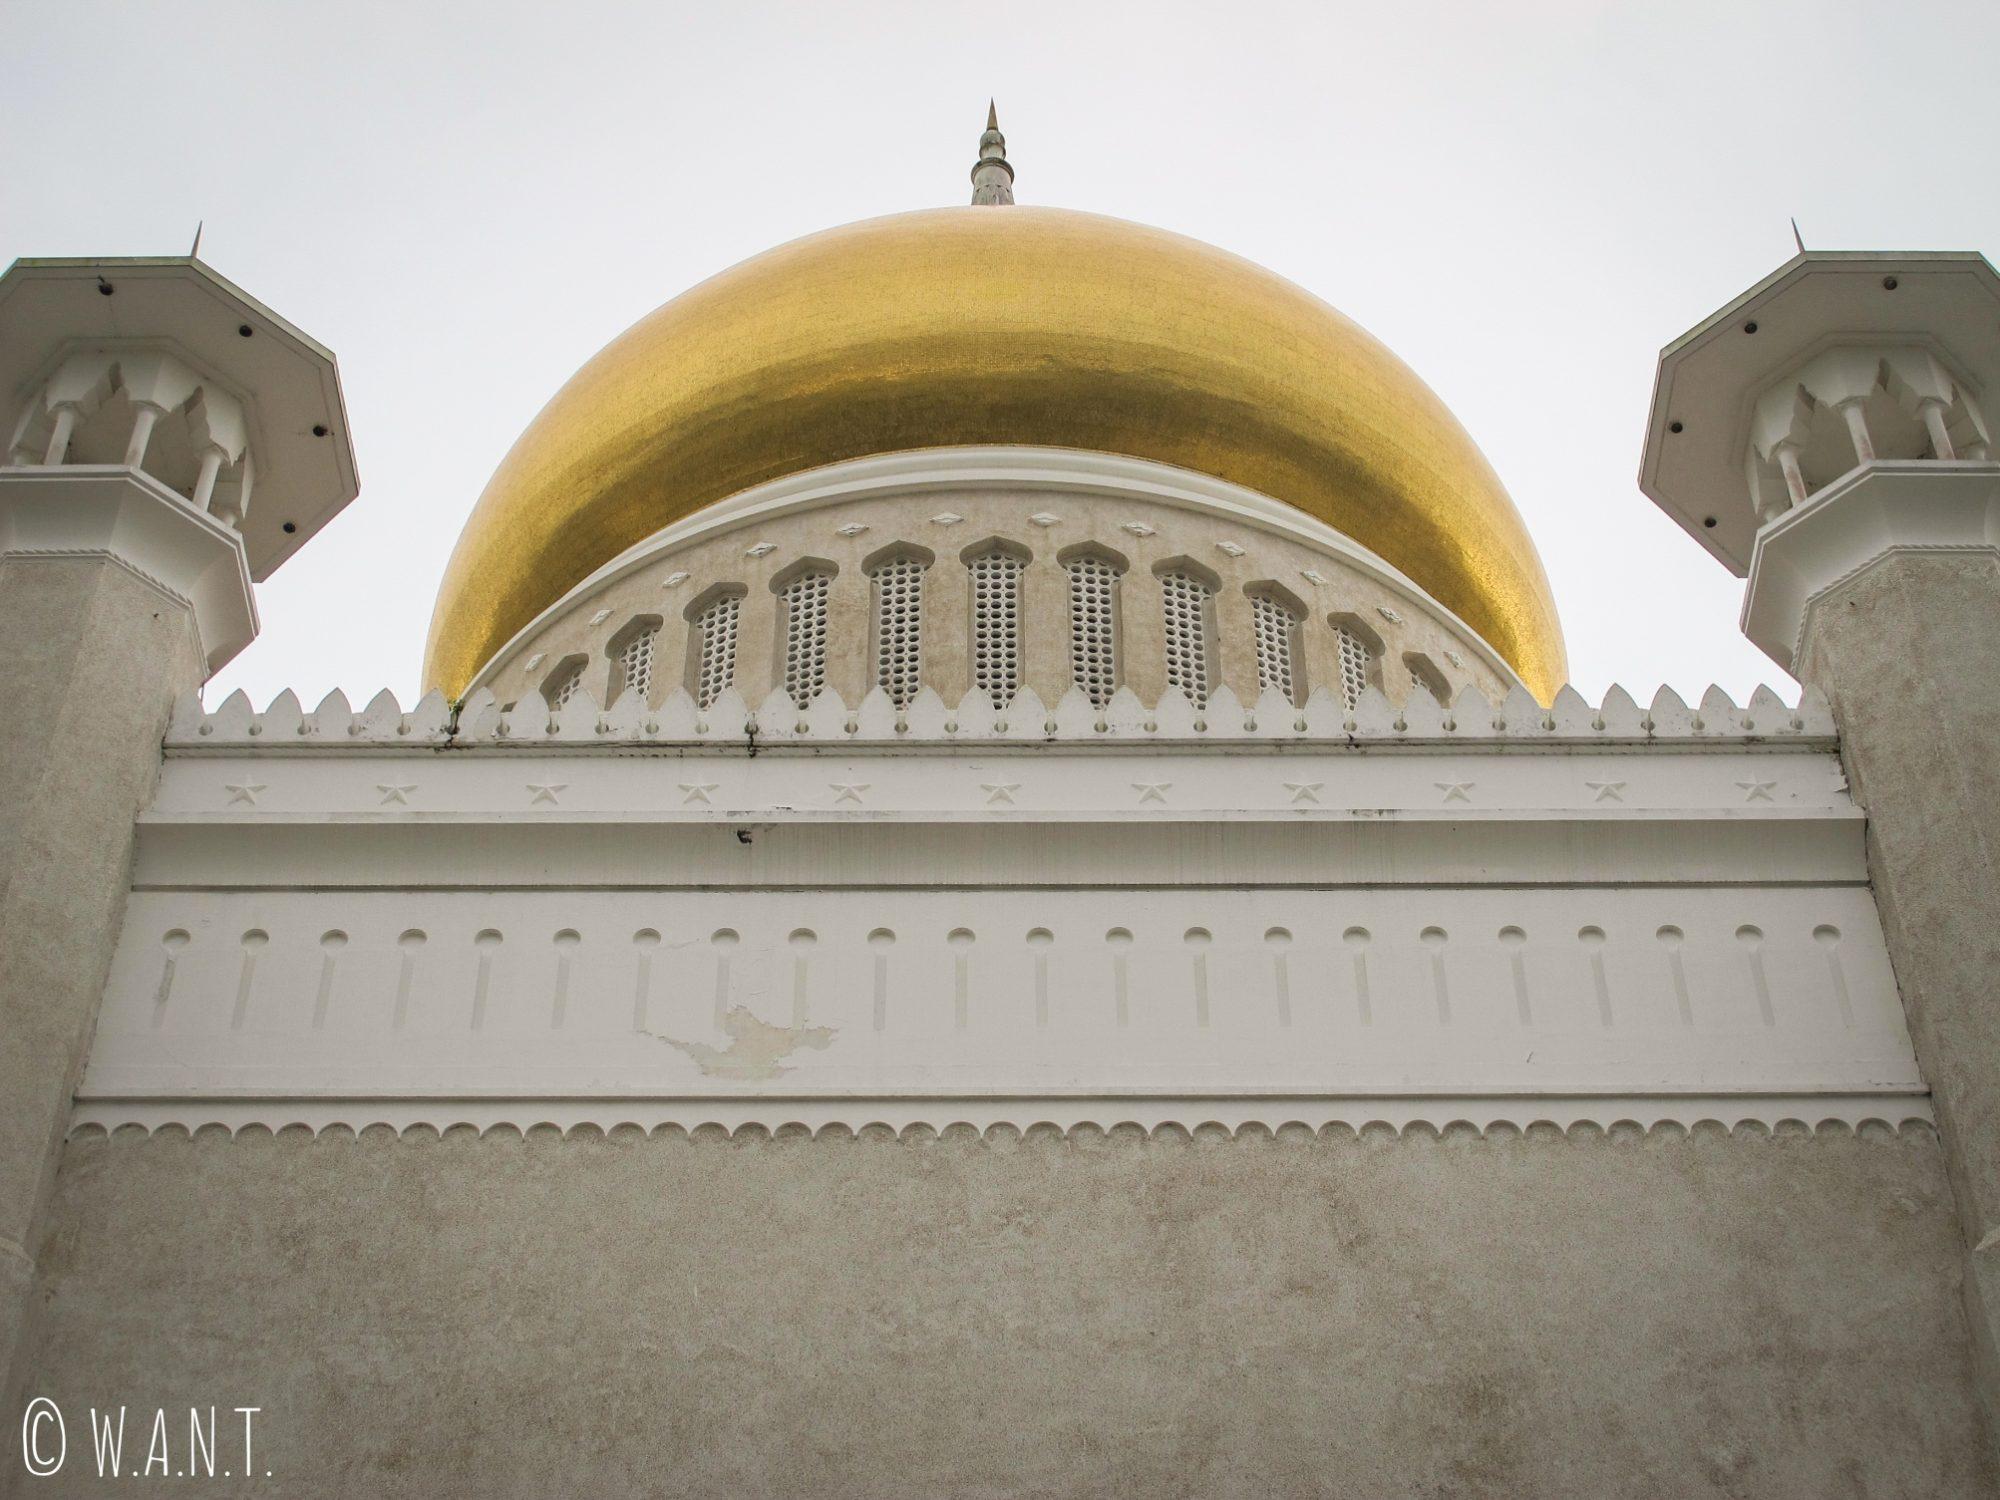 Dôme et minarets de la mosquée Masjid Omar Ali Saifuddien de Bandar Seri Begawan